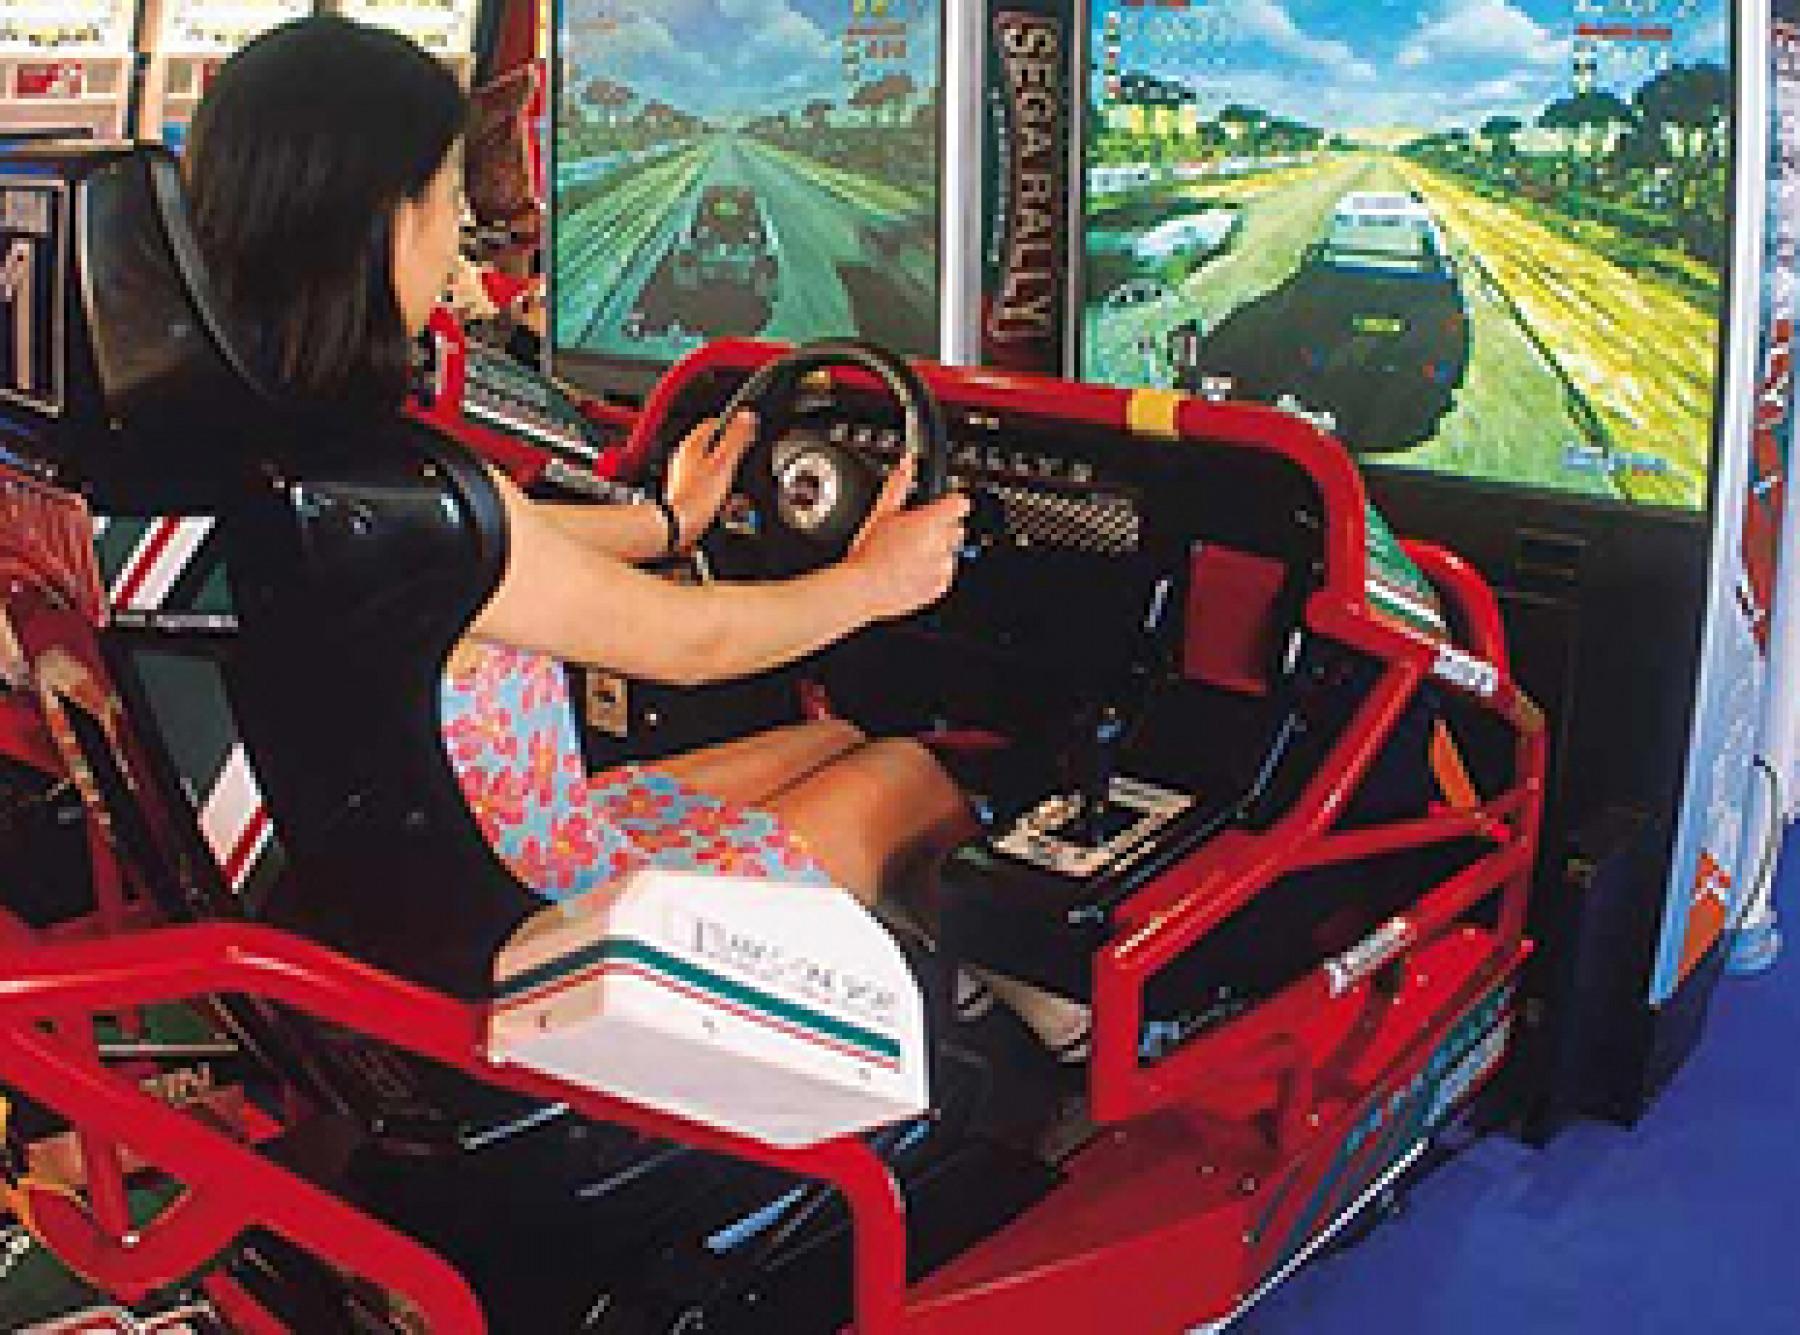 Norwegian Cruise Line Norwegian Sky Interior Video Arcade.jpg